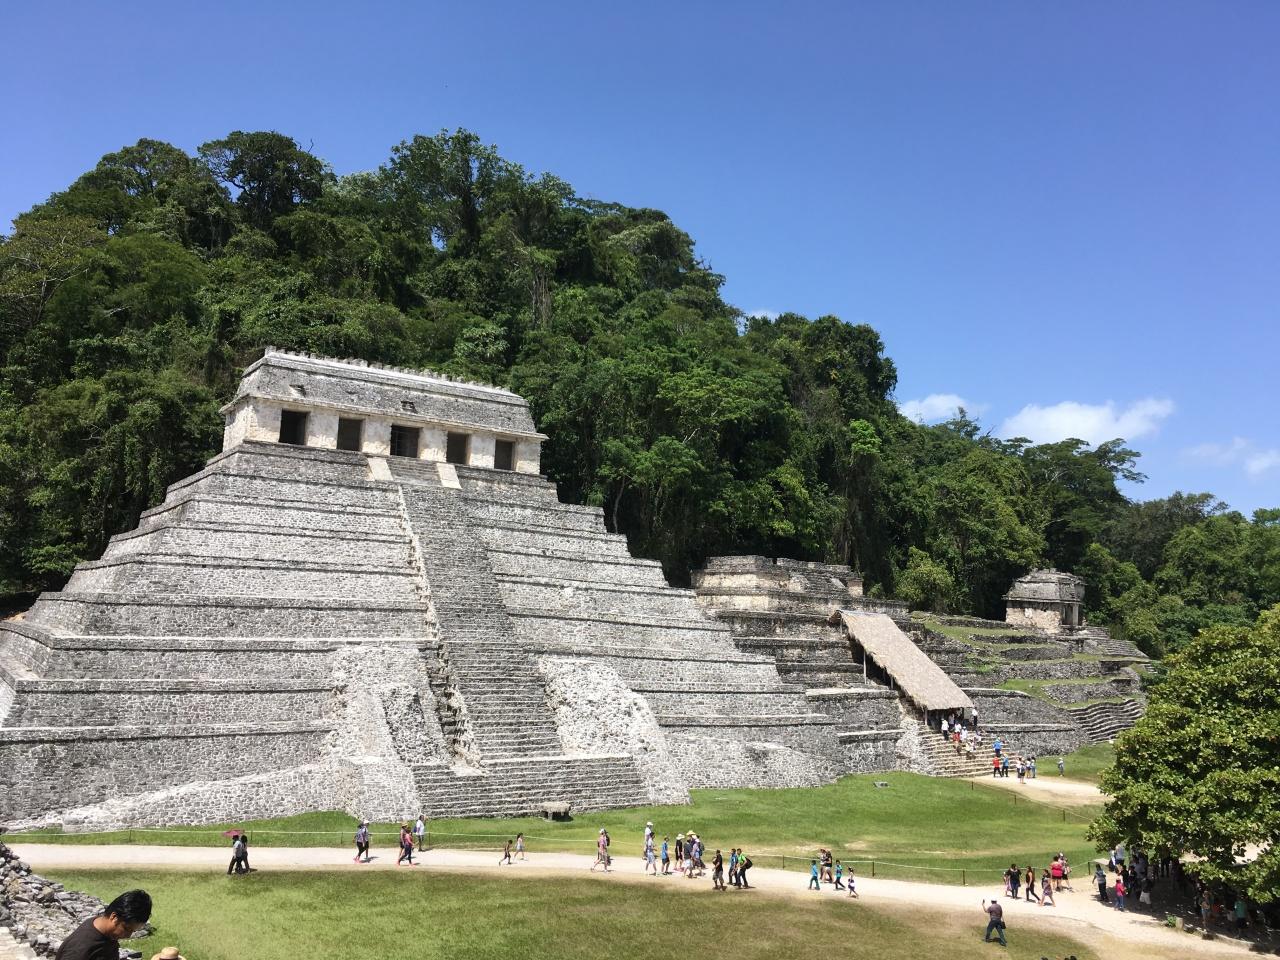 Discover hidden Maya ruins in the jungle ofPalenque